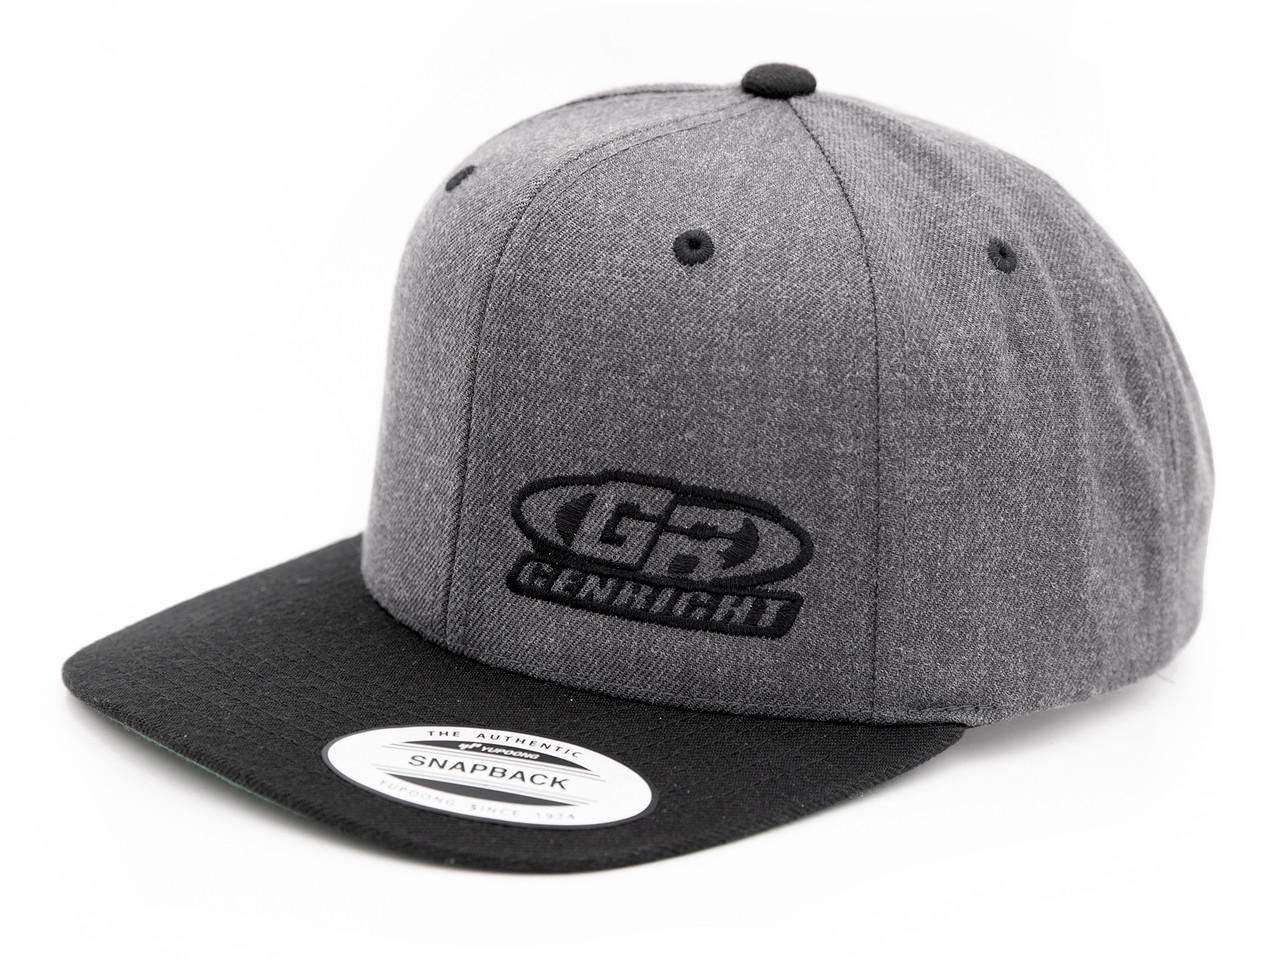 enRight Logo Premium 6-Panel Snapback Cap (Charcoal/Black)